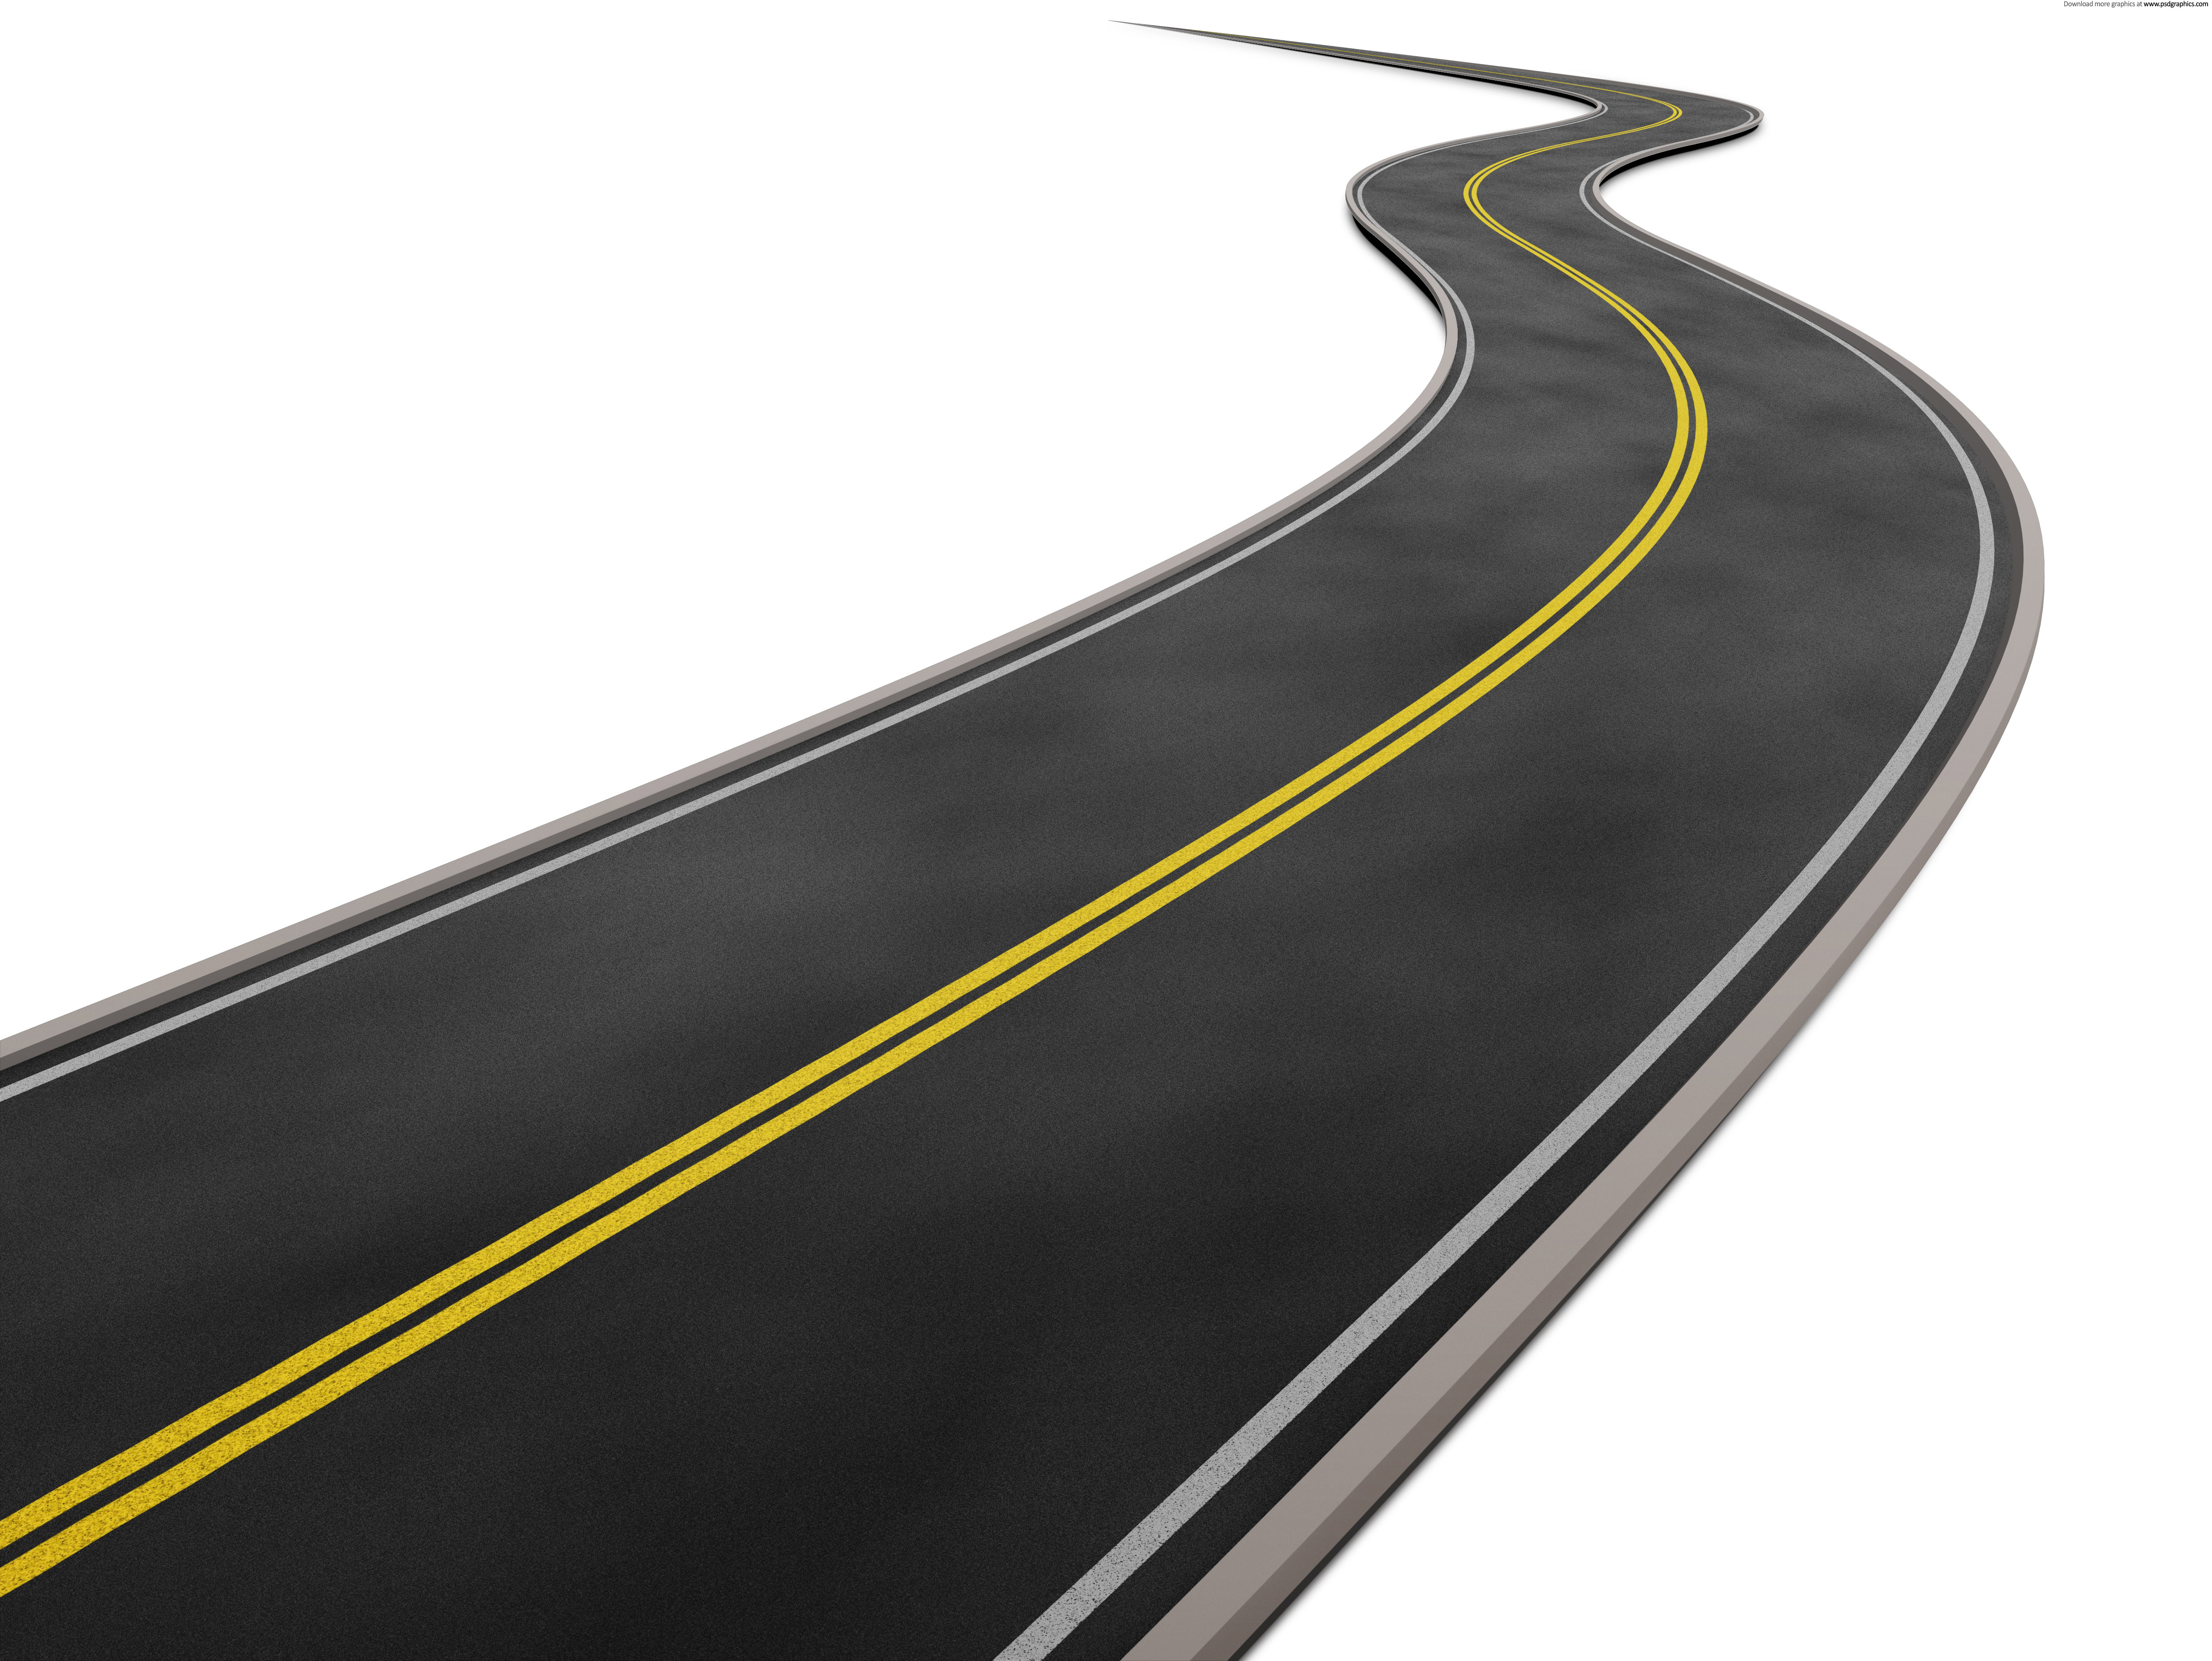 Clipart Straight Road .-Clipart Straight Road .-3